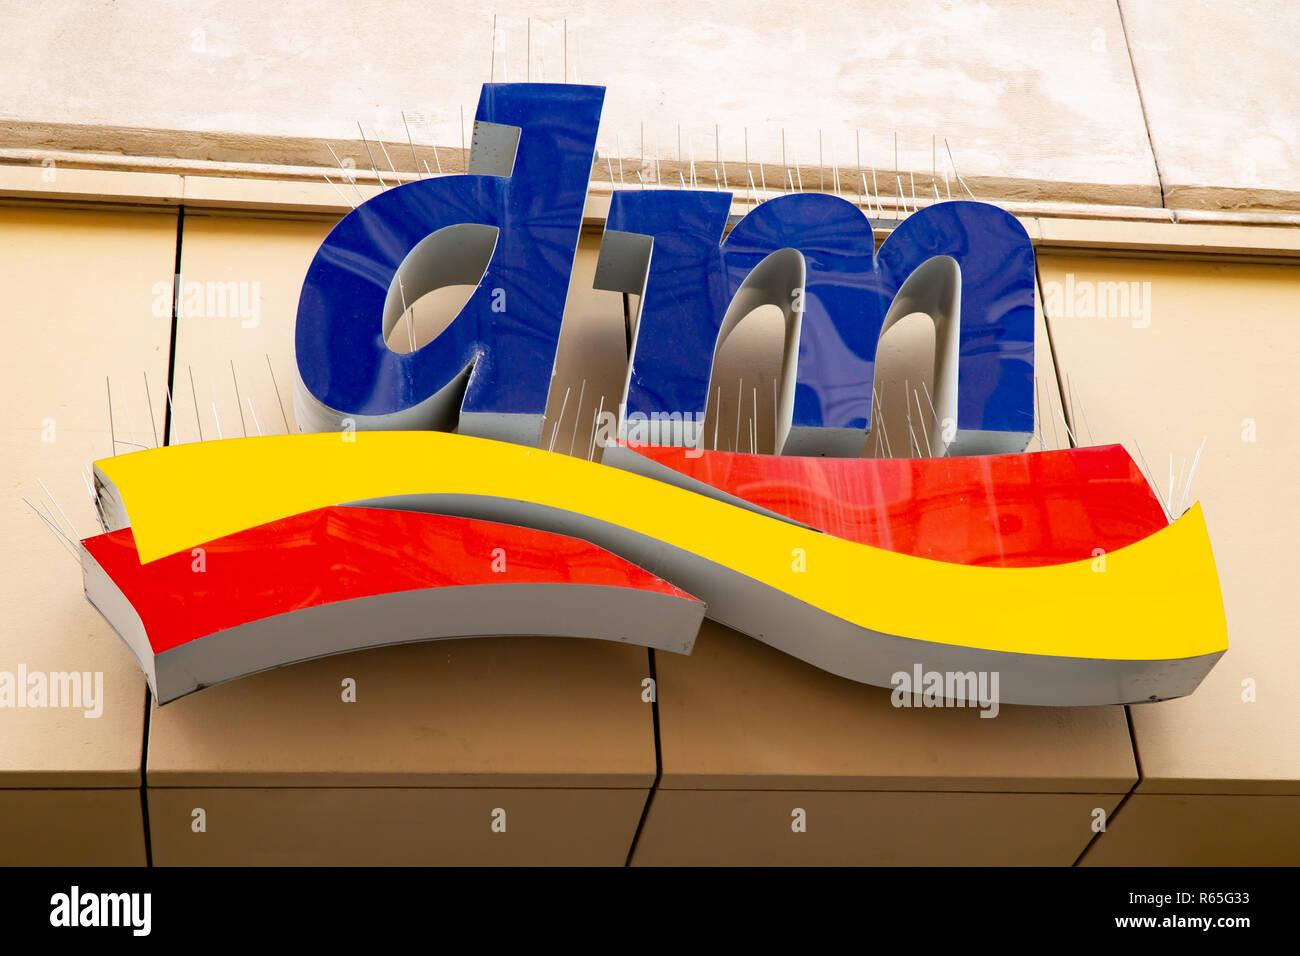 Wiesbaden, Allemagne - 03 juin 2018   DM logo sur une façade. Dm- f431d0327053